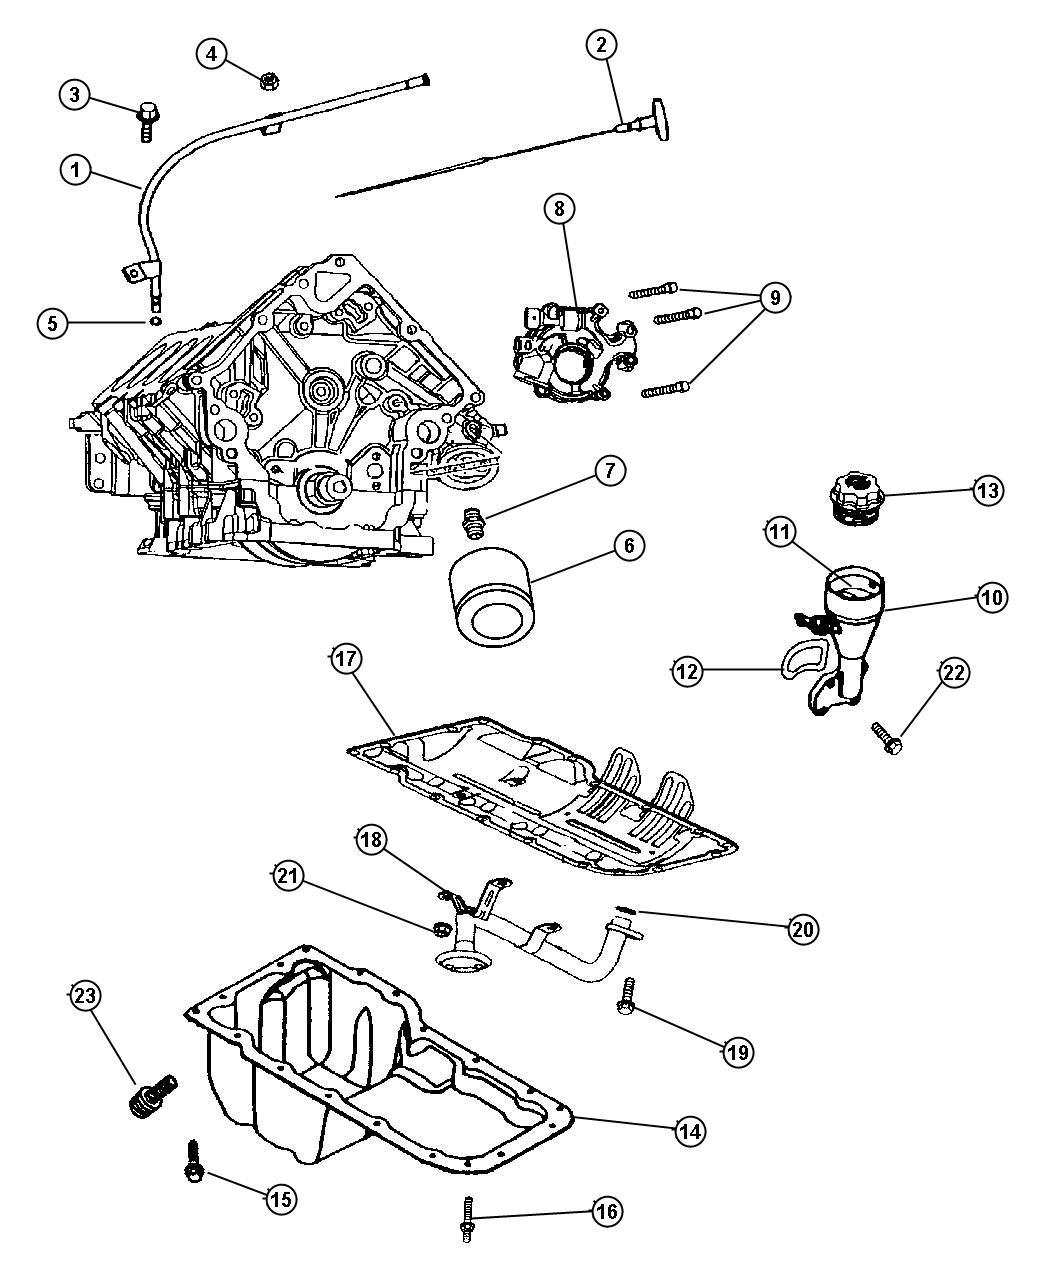 Jeep Grand Cherokee Filter Engine Oil Magneti Marelli